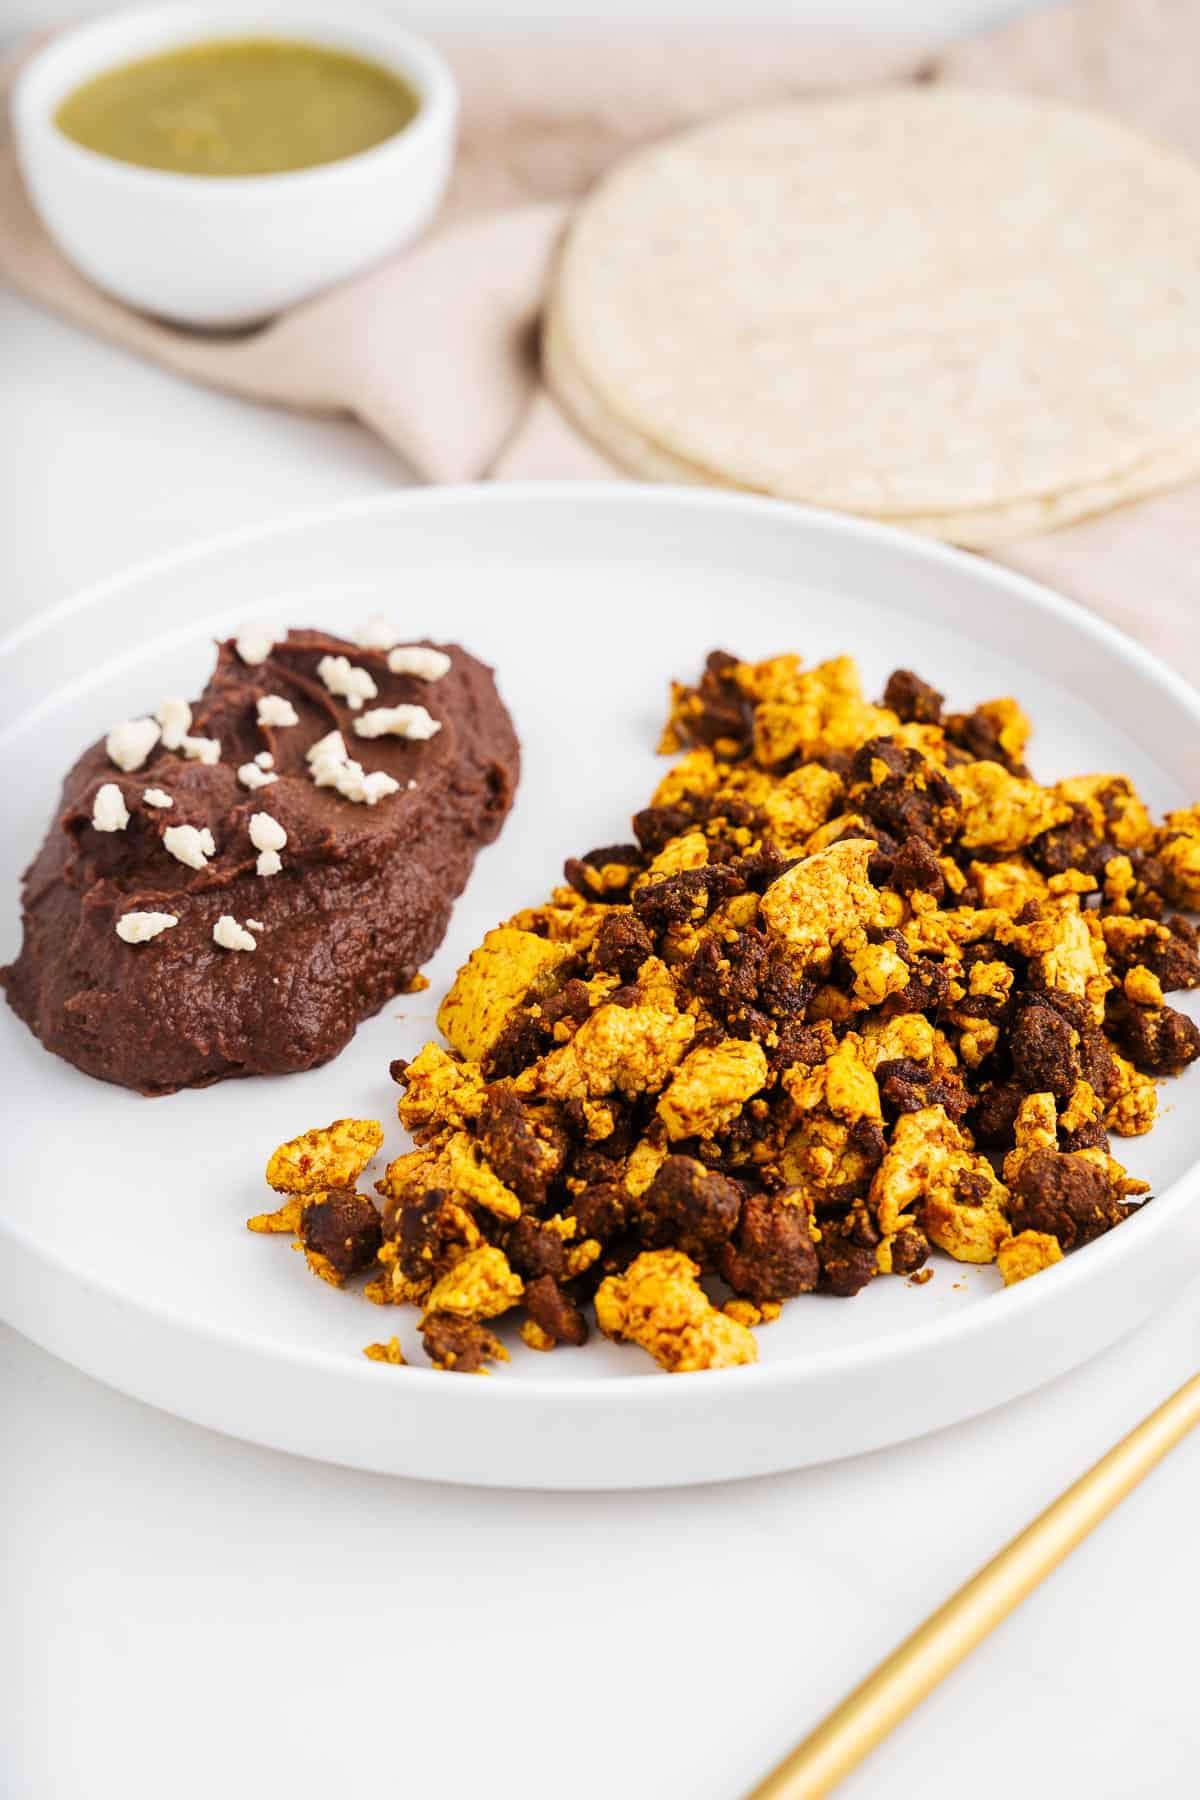 Vegan Huevos con Chorizo and Refried Beans on a Plate